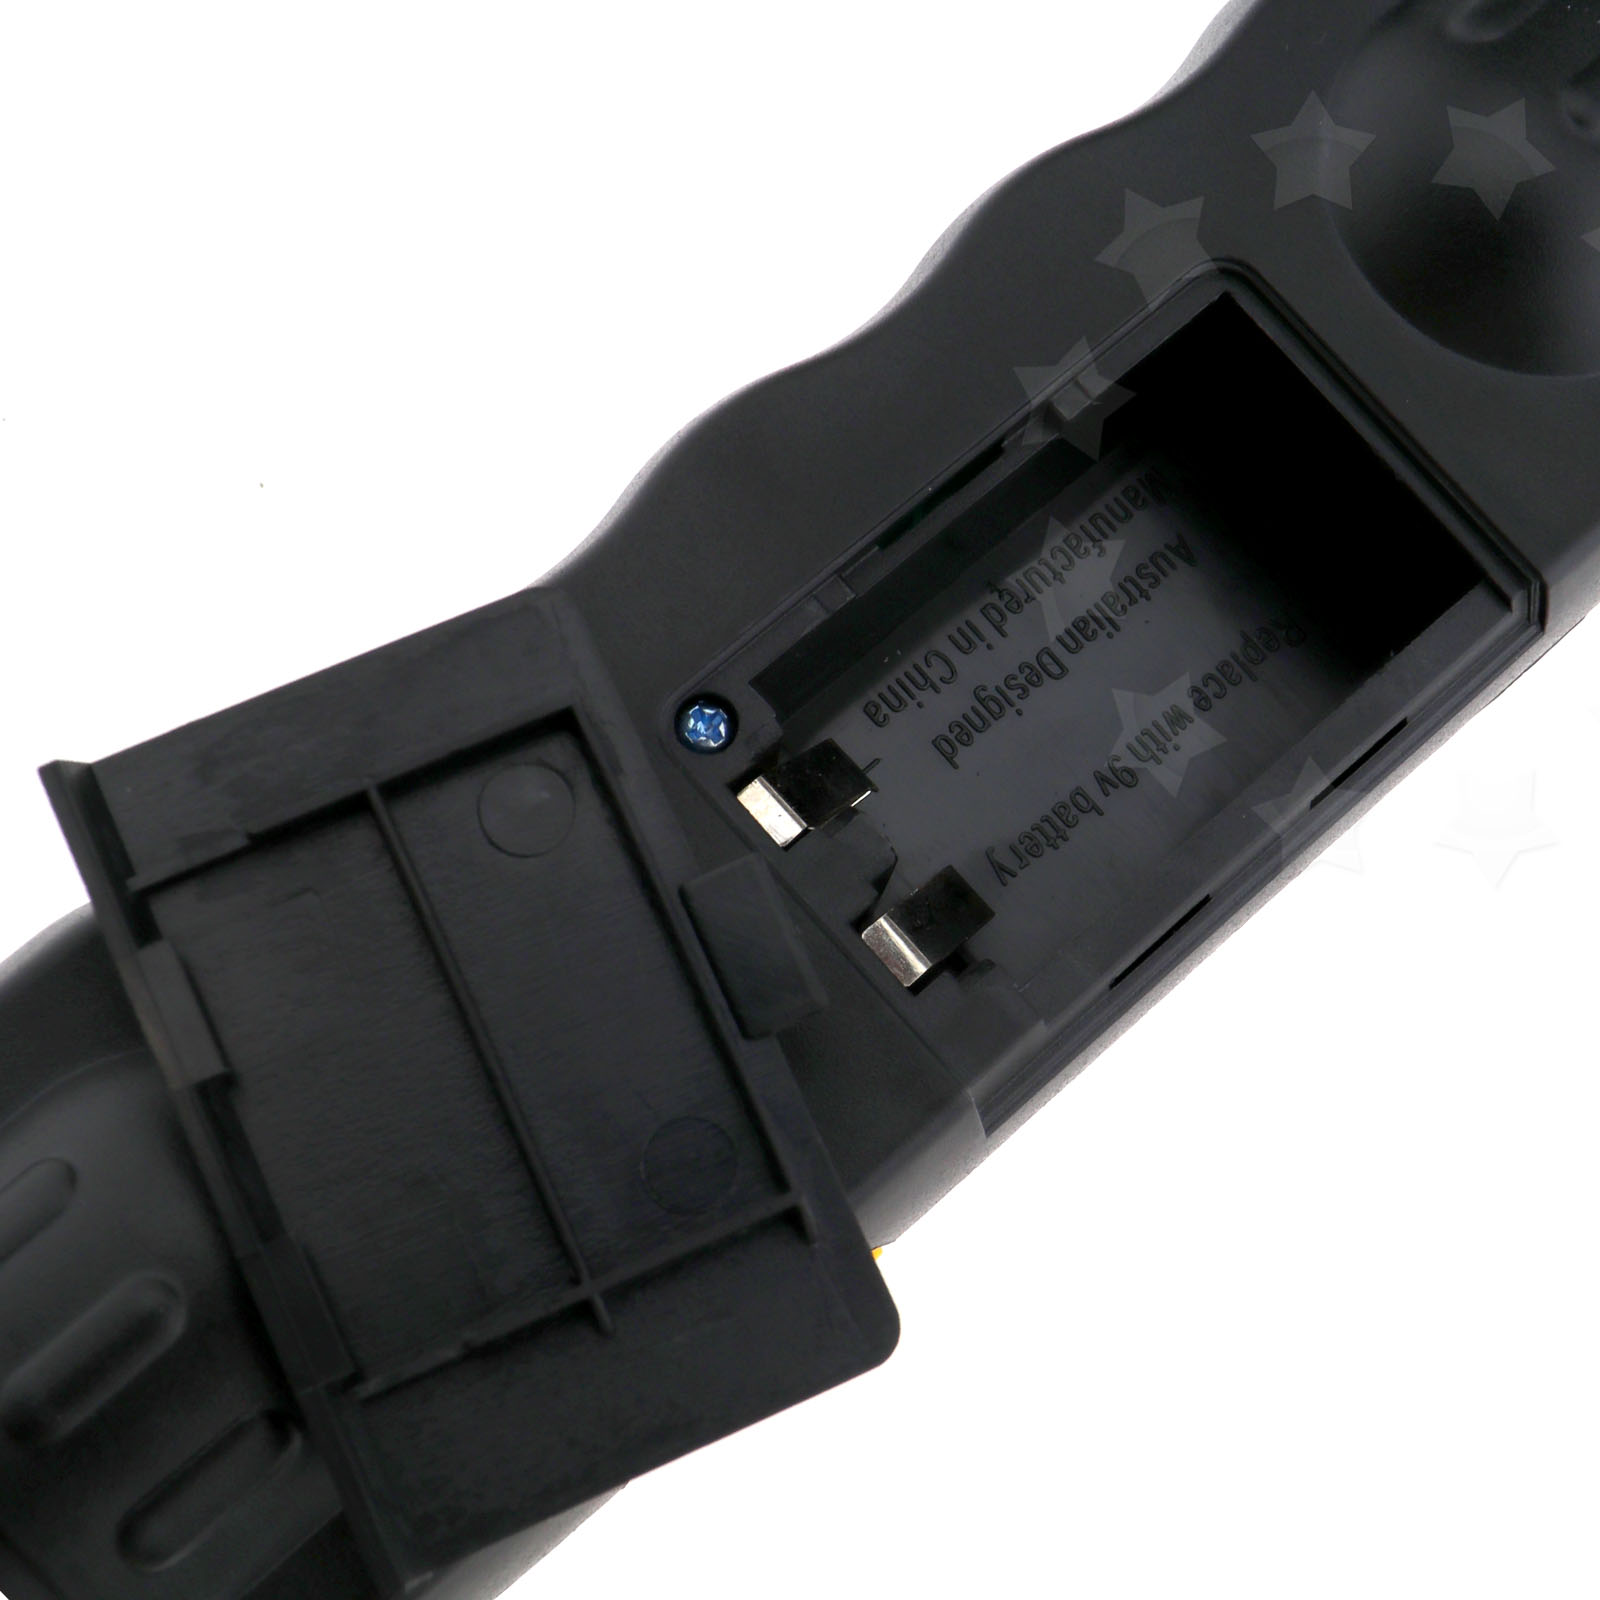 Trailer Wiring Tester Australia Solutions Circuit 12v Caravan 7 Pin Towing Tow Bar Light